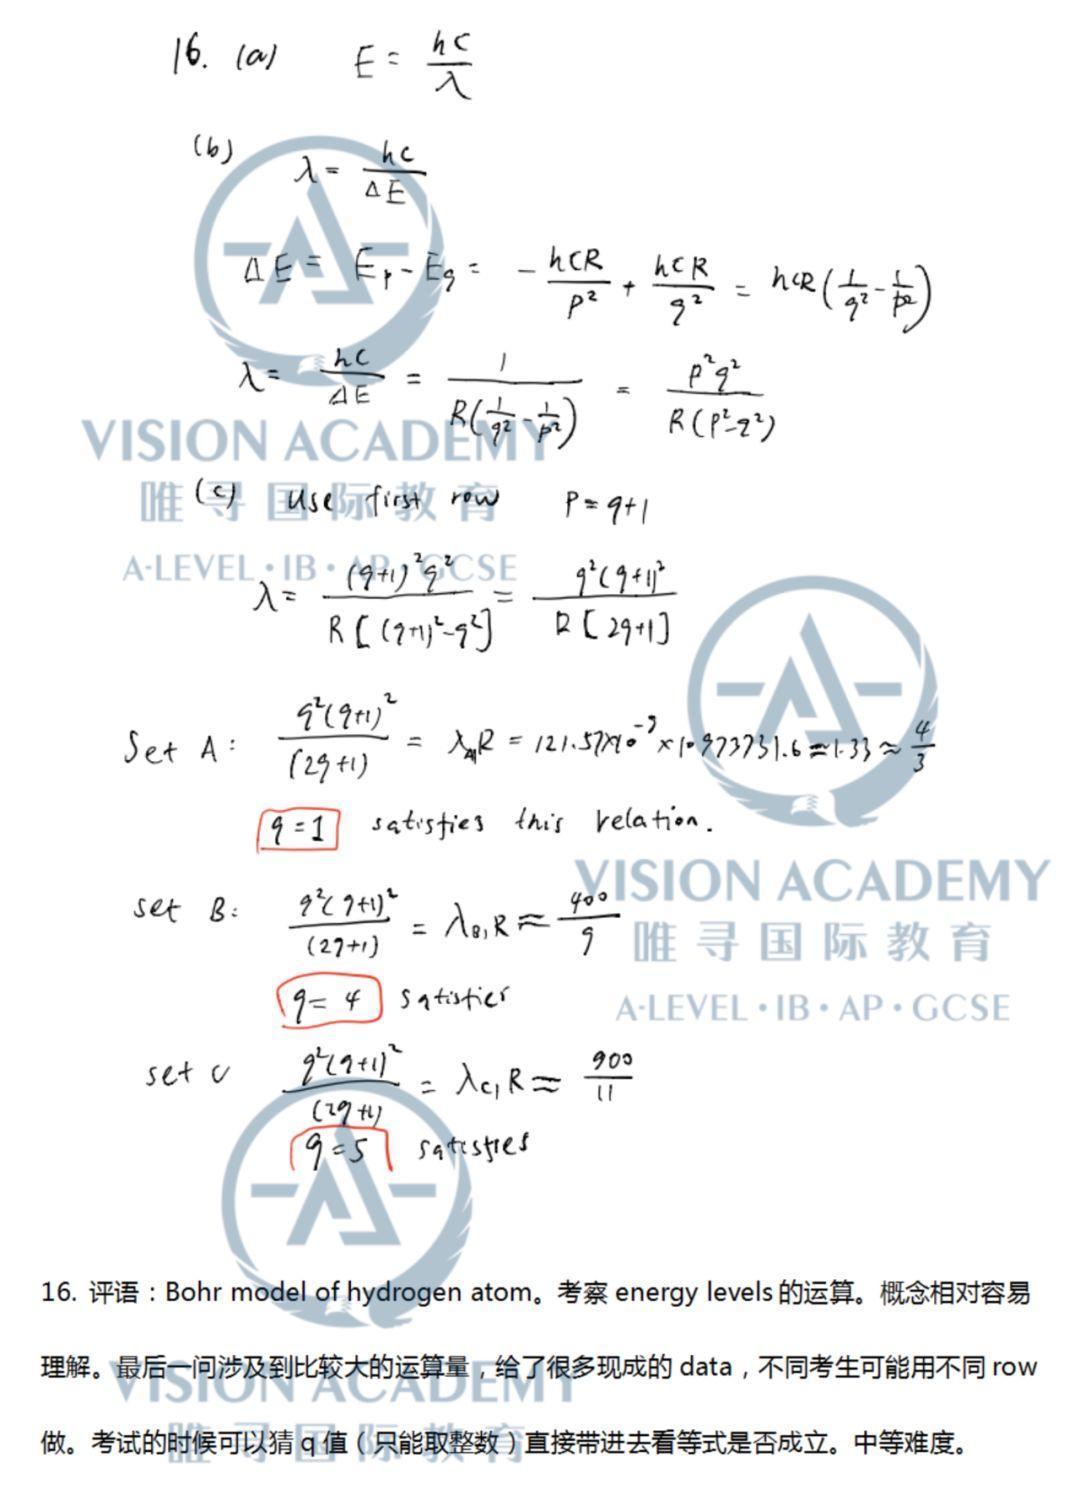 PAT2019最全真题+天团解析+考情分析来了! 自评快看  牛津大学 考试 竞赛 第18张